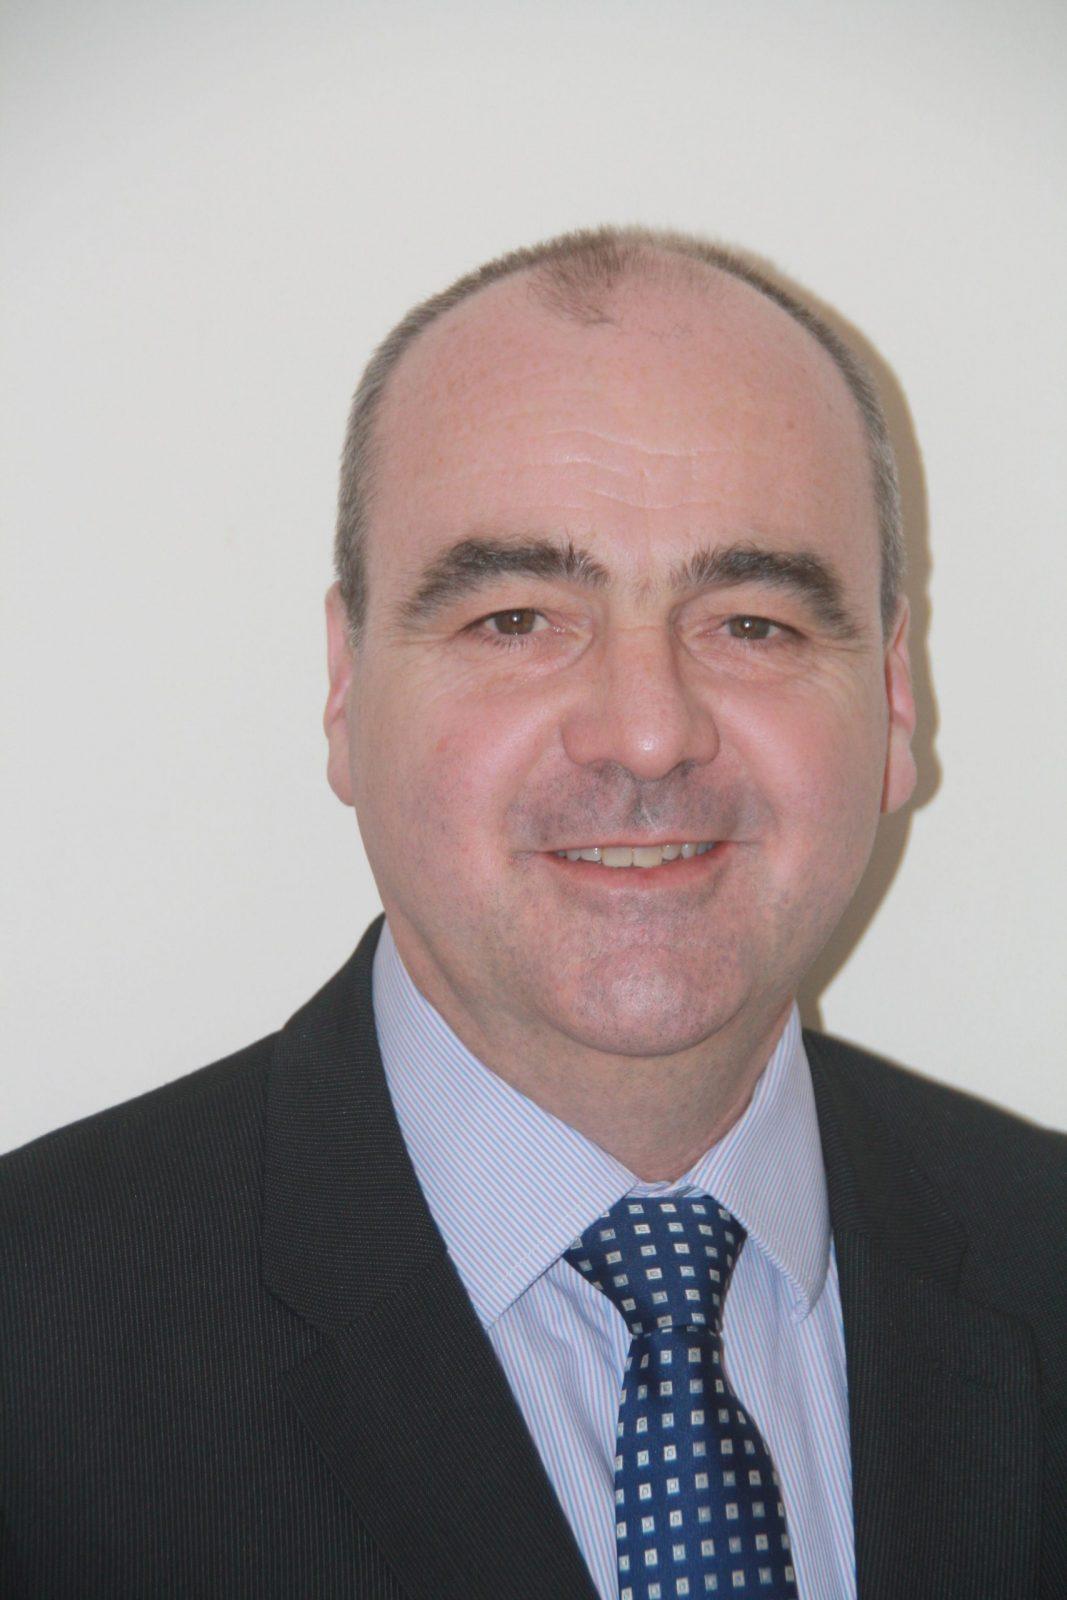 Dr Richard Beal